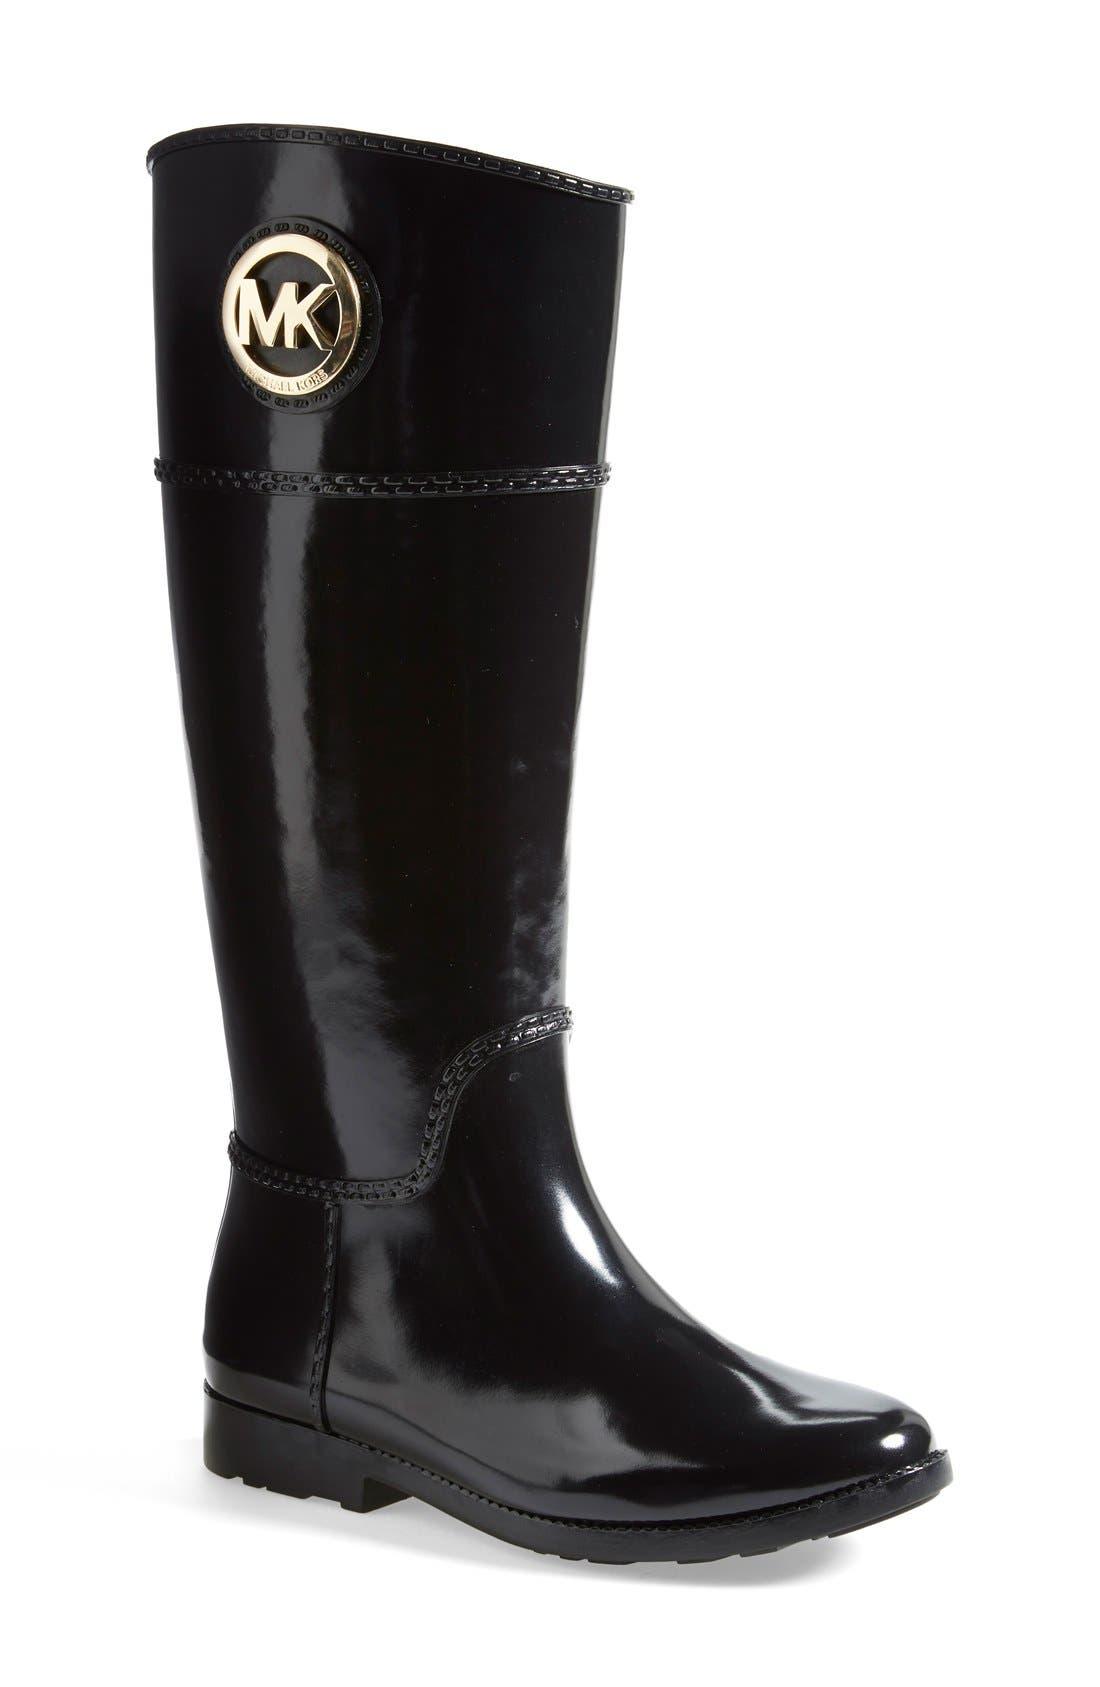 Alternate Image 1 Selected - MICHAEL Michael Kors 'Stockard' Rain Boot (Women)